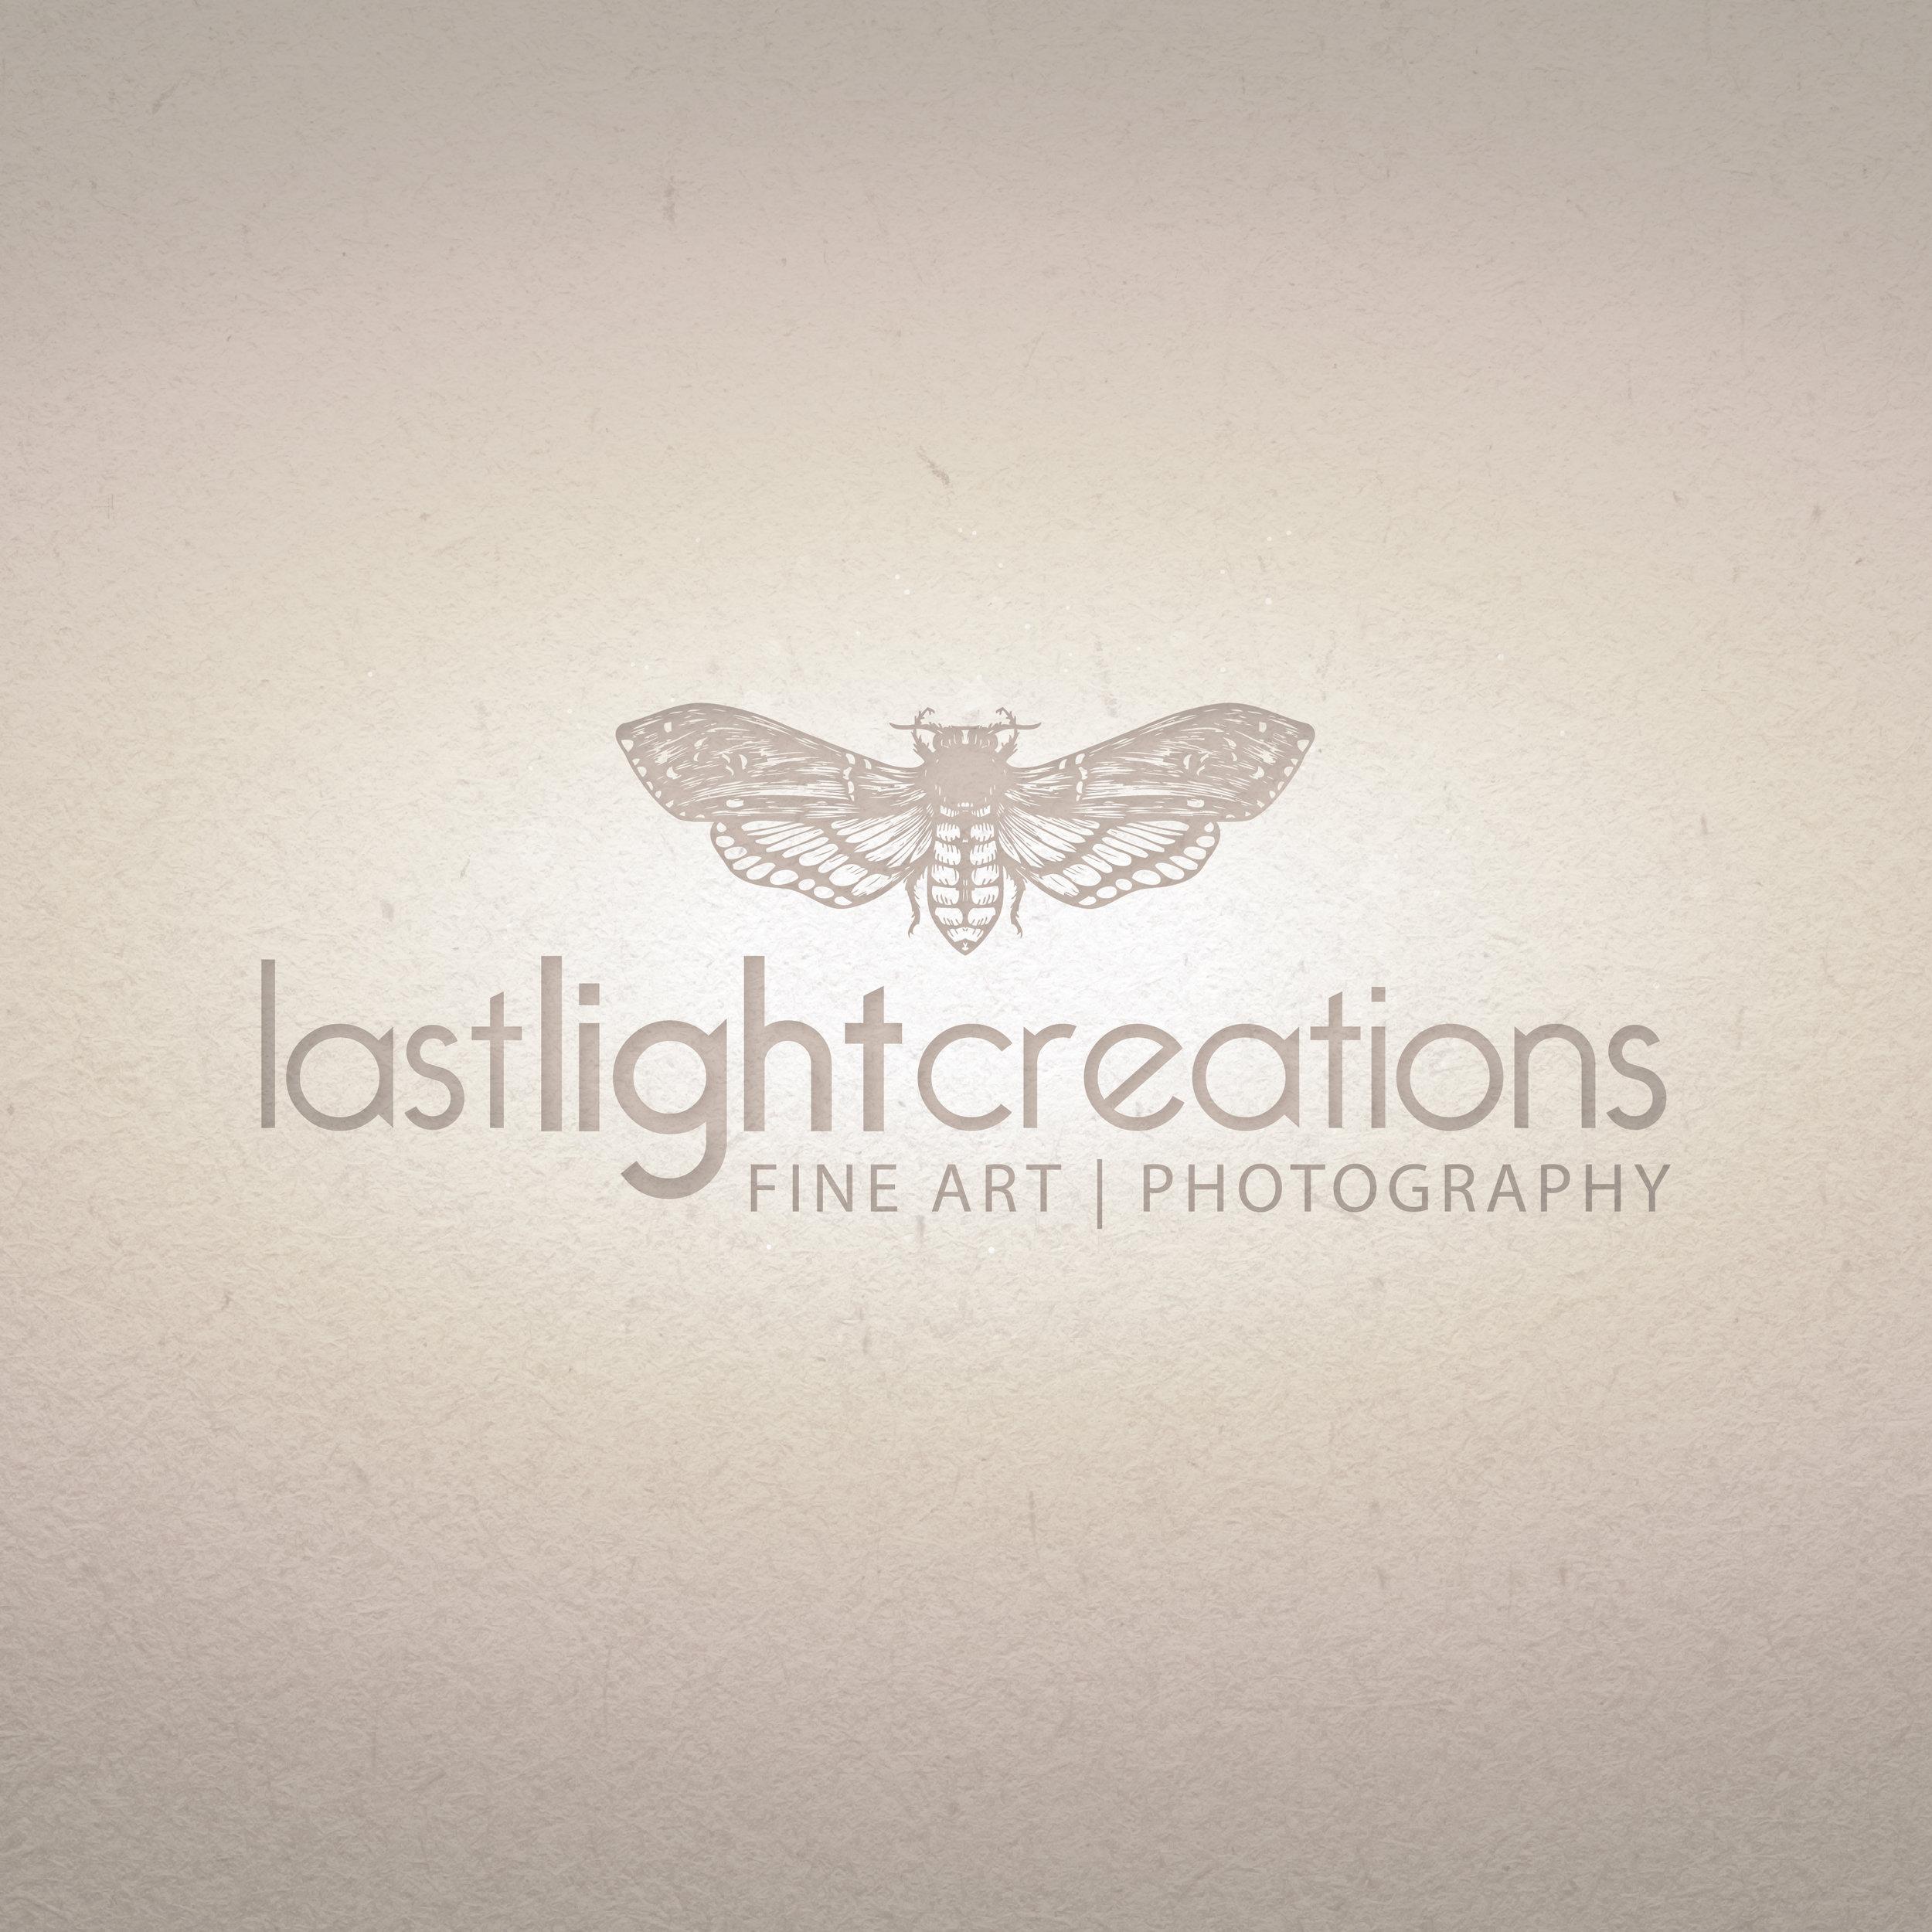 lastlightcreations Logo Design-14.jpg